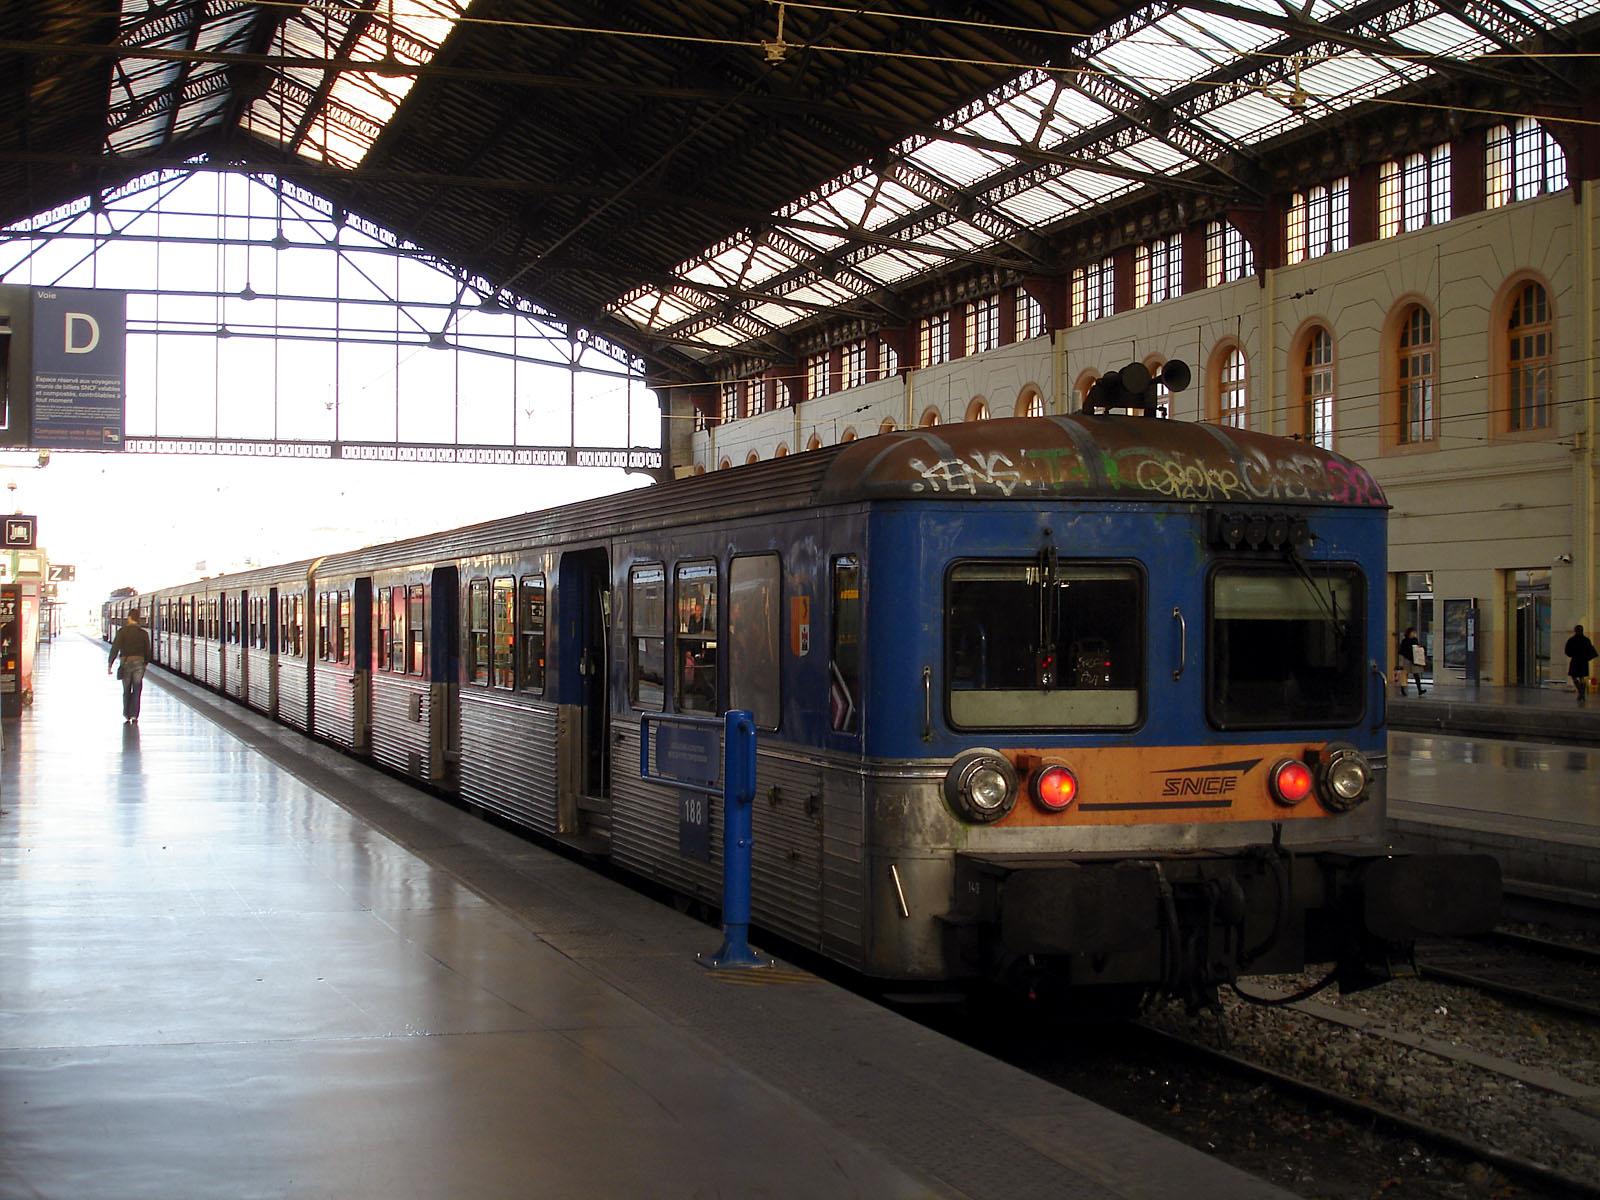 Fichier gare de marseille saint charles rio - Distance gare saint charles port marseille ...